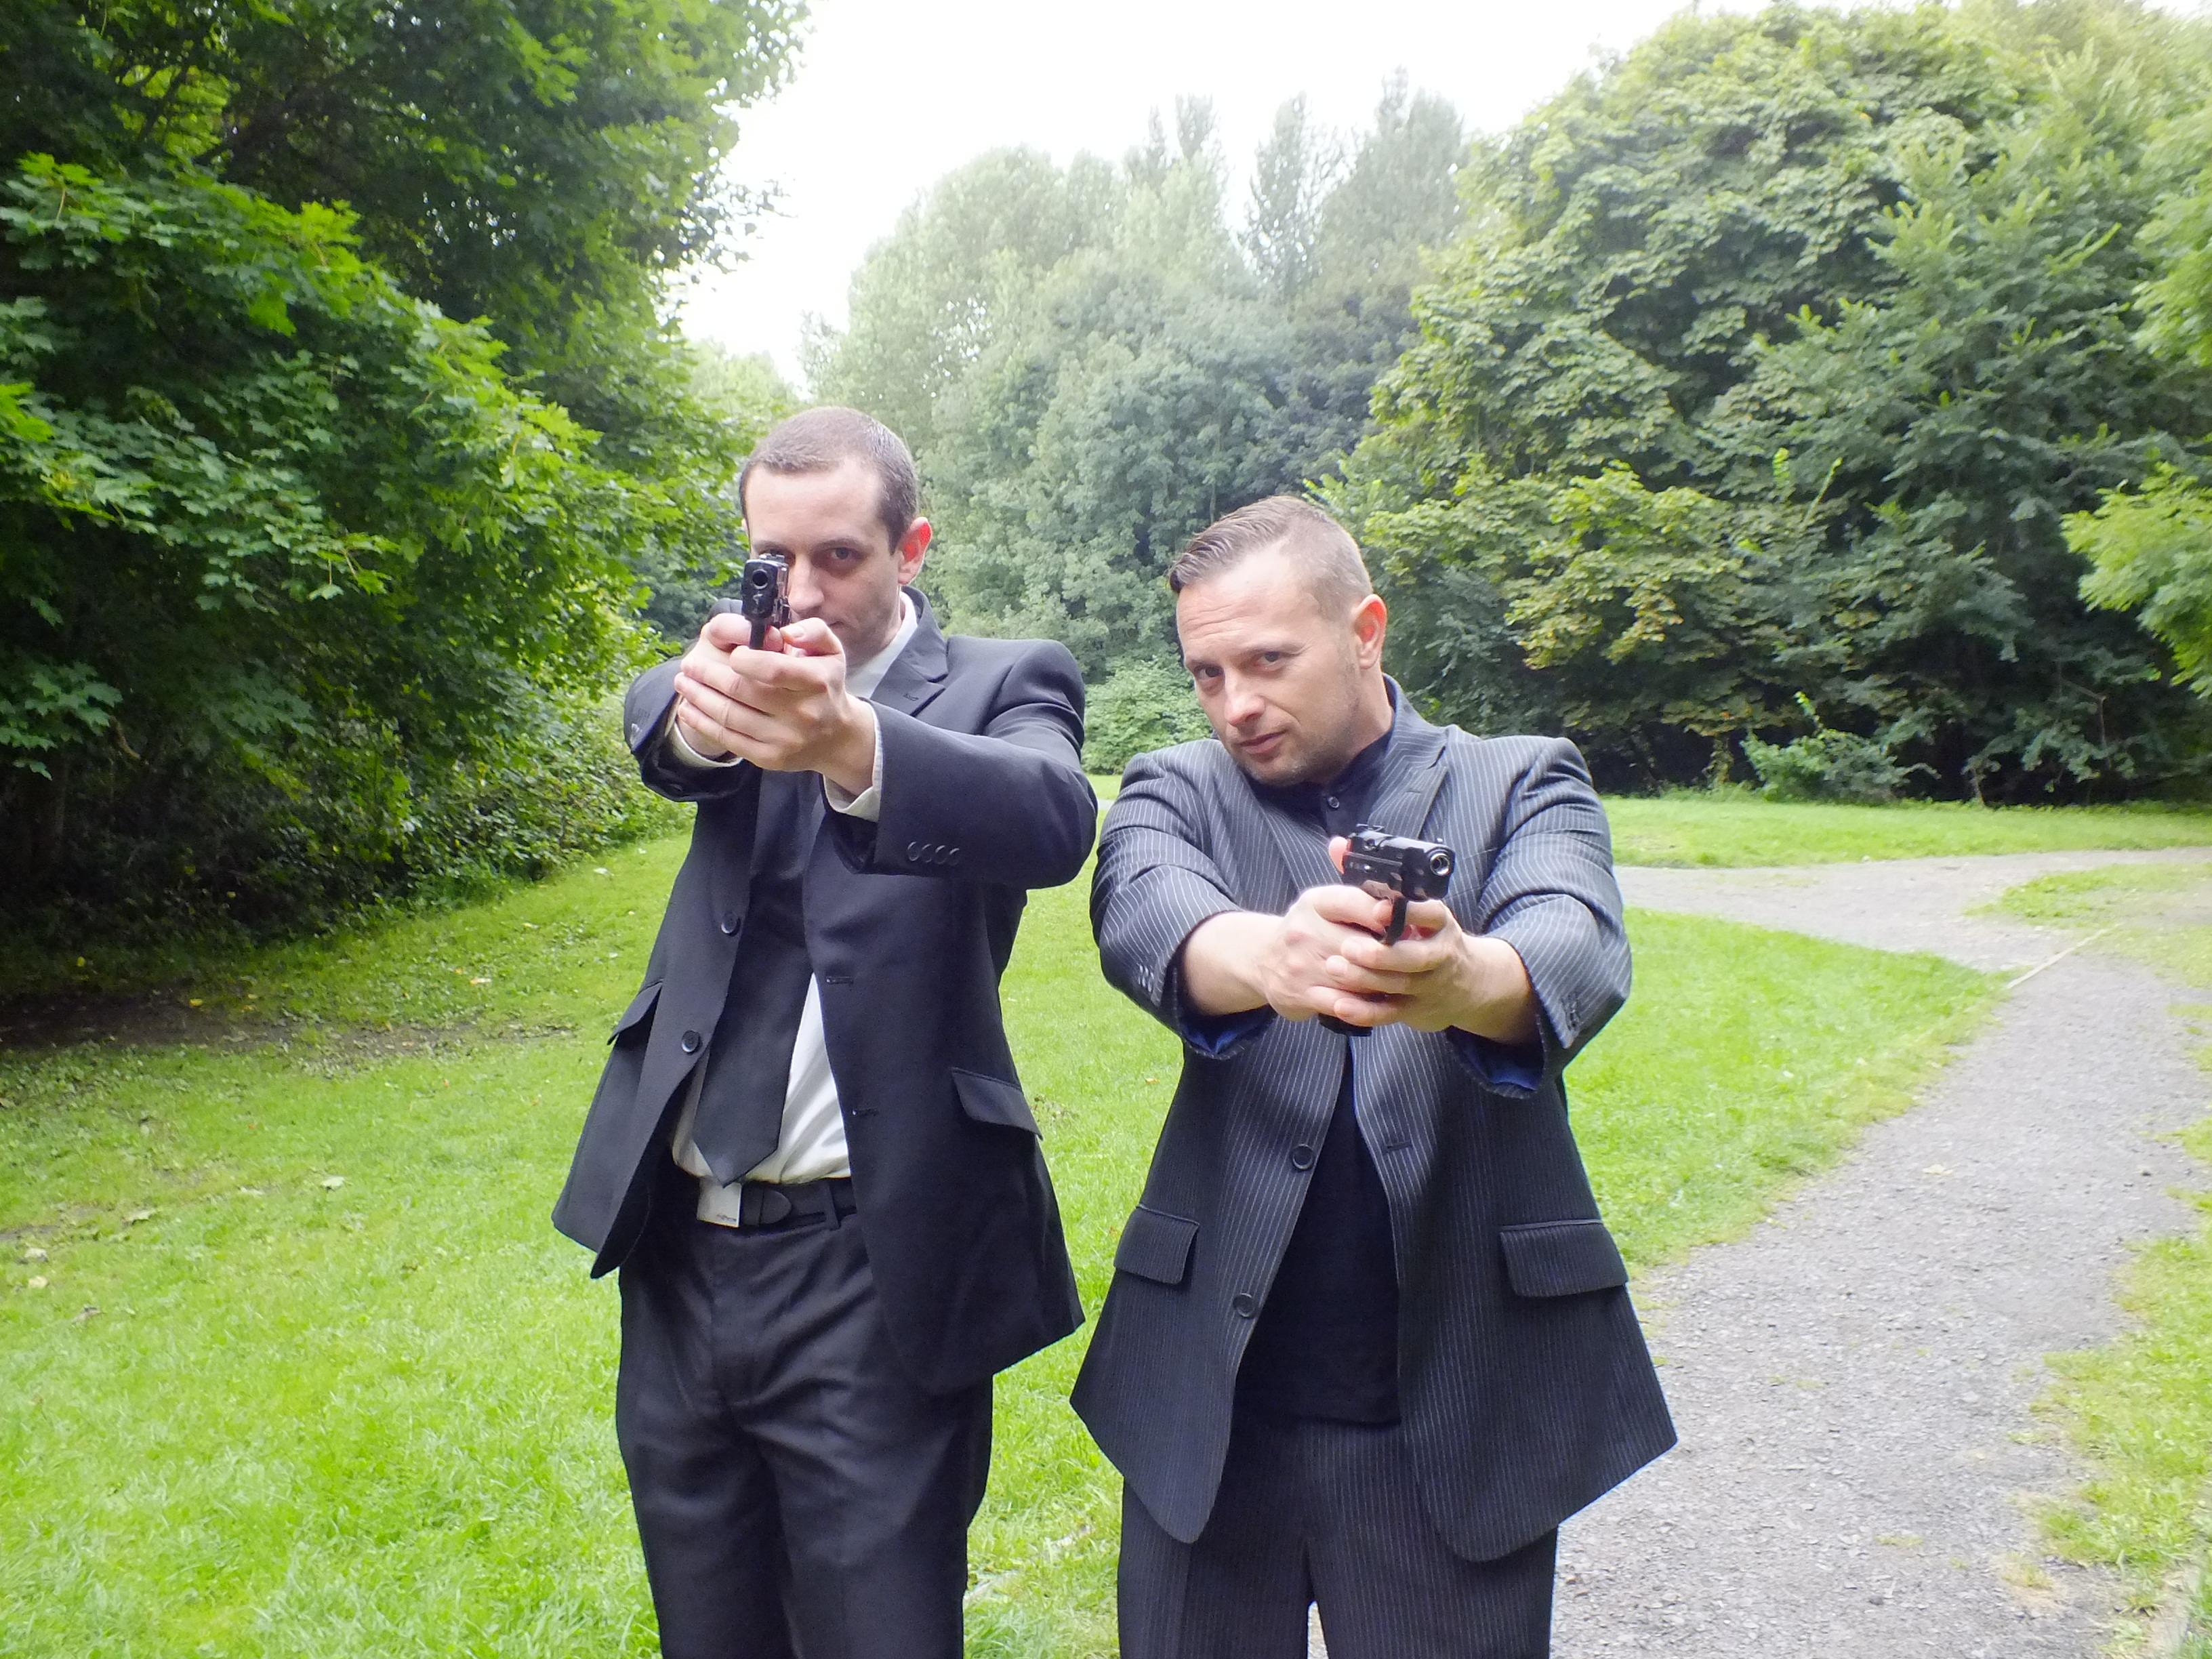 The Gamekeeper - Wandering Kane Productions